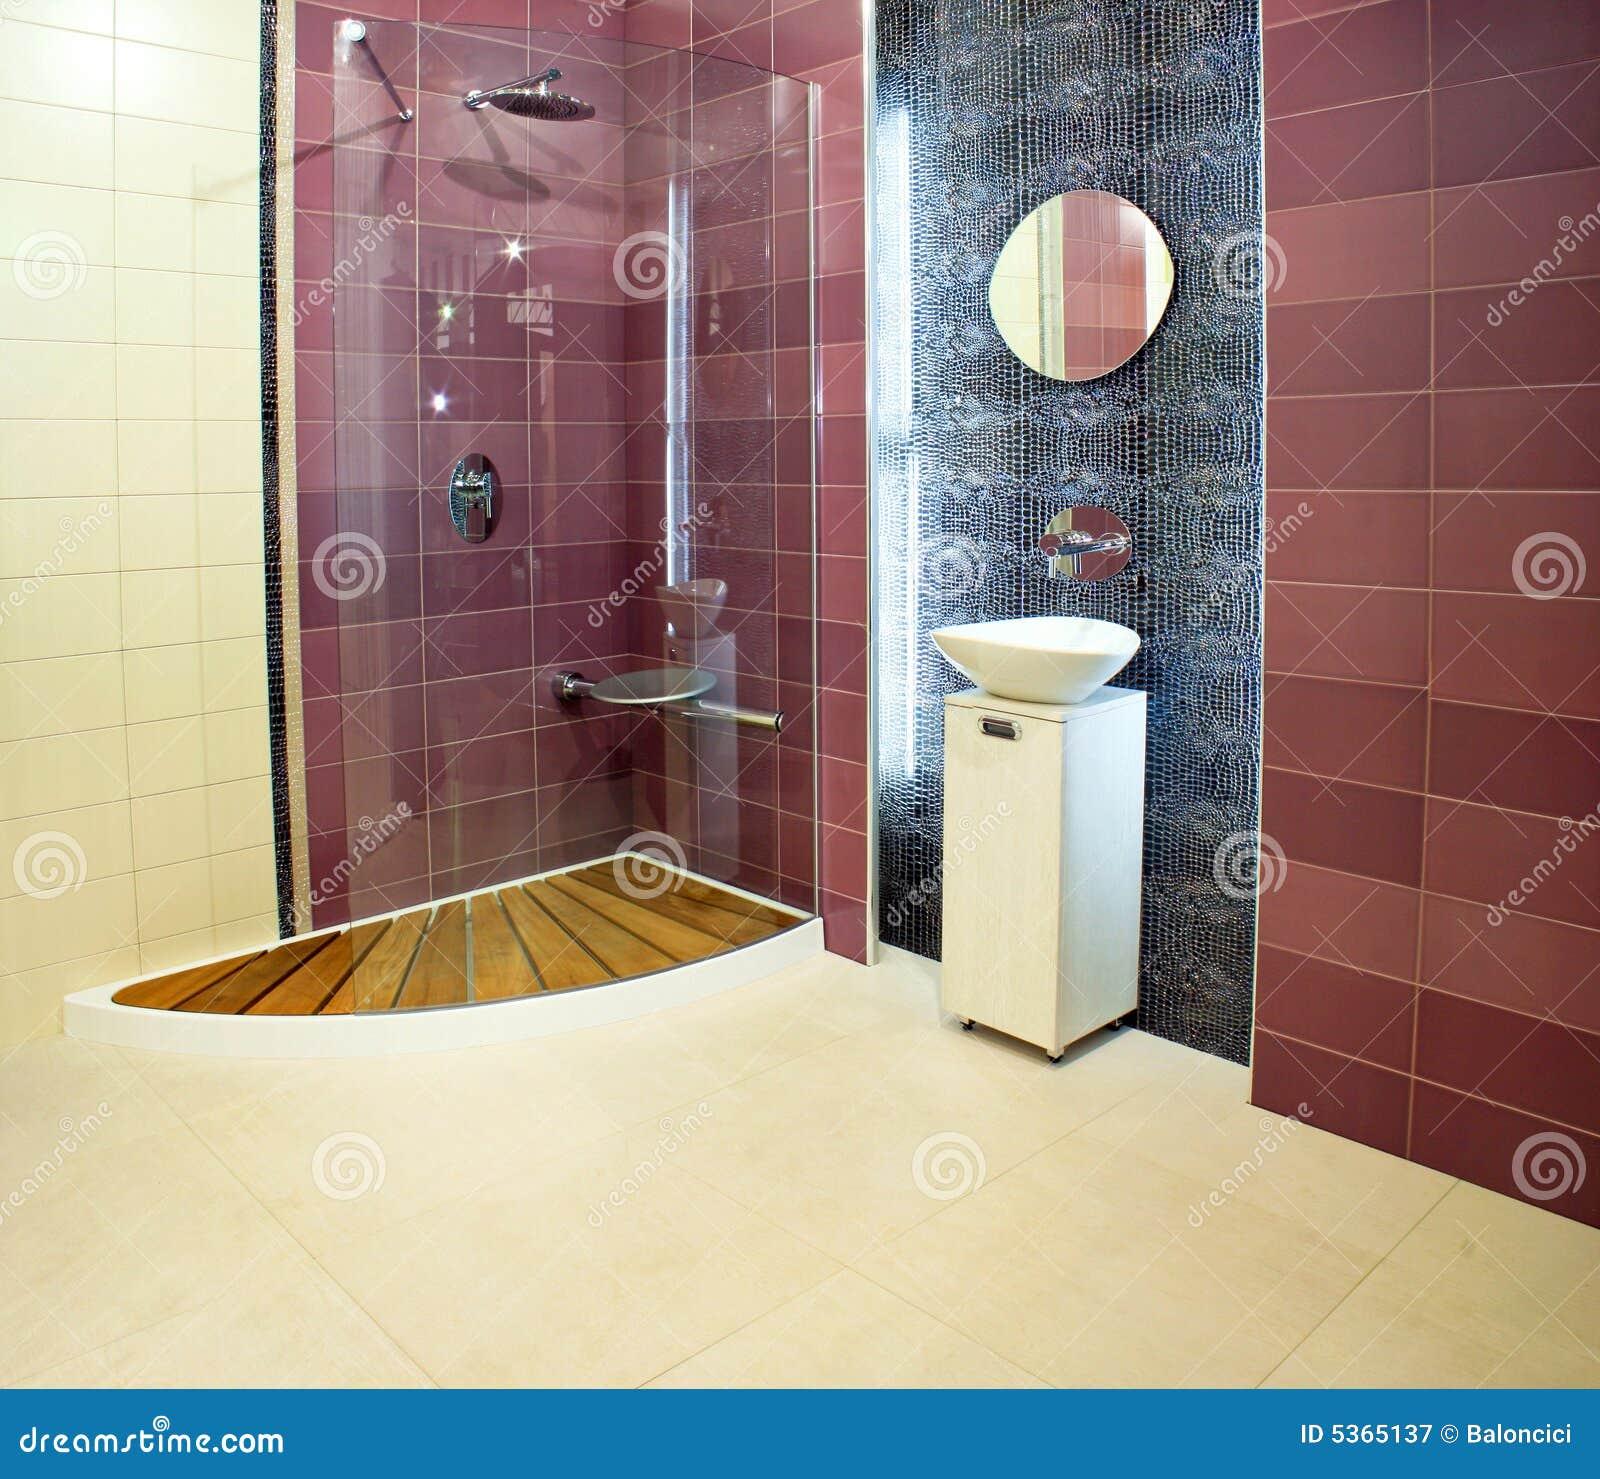 Tibonianet - Piastrelle bagno viola ...